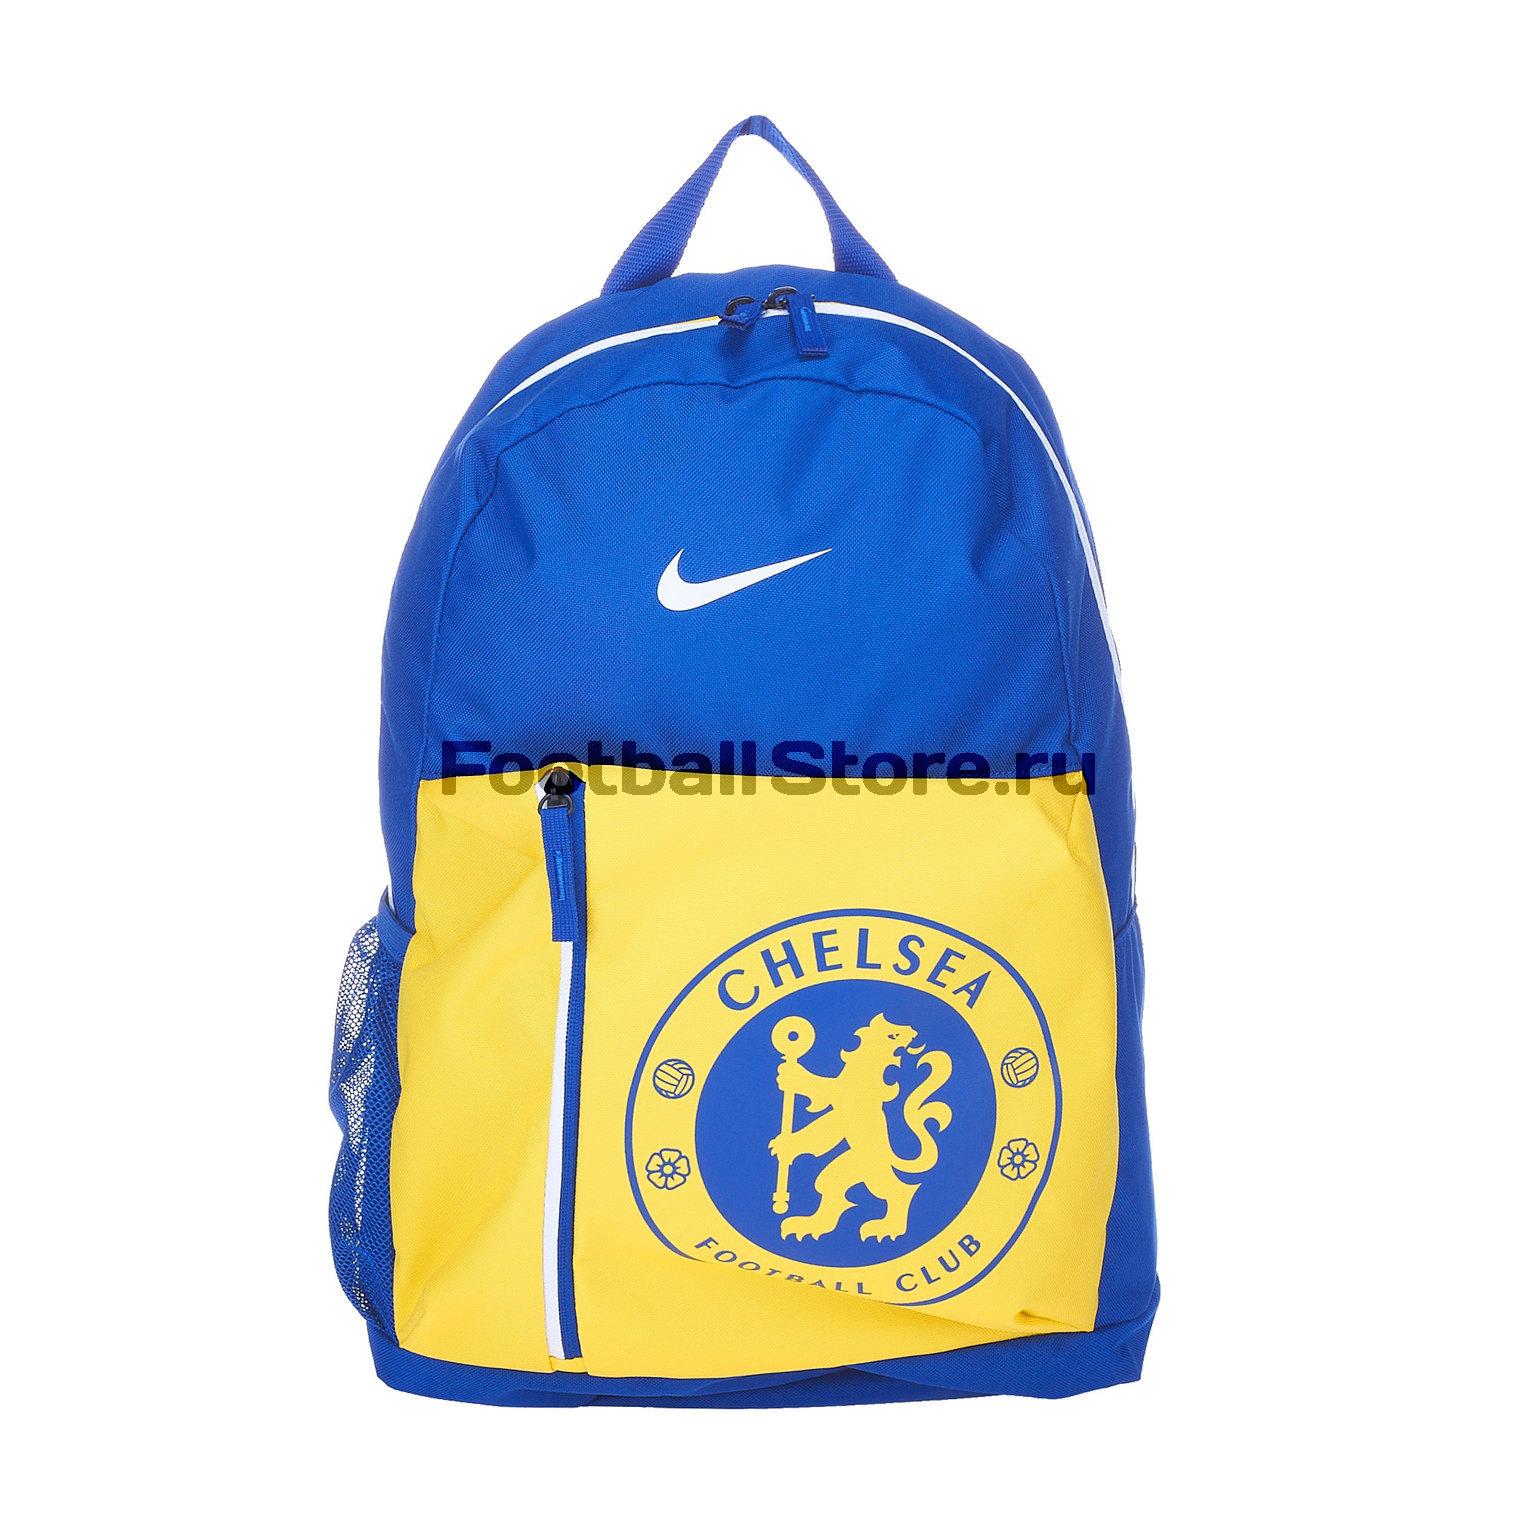 Рюкзак детский Nike Chelsea Stadium BA5525-495 chelsea nike перчатки тренировочные nike chelsea gs0353 060